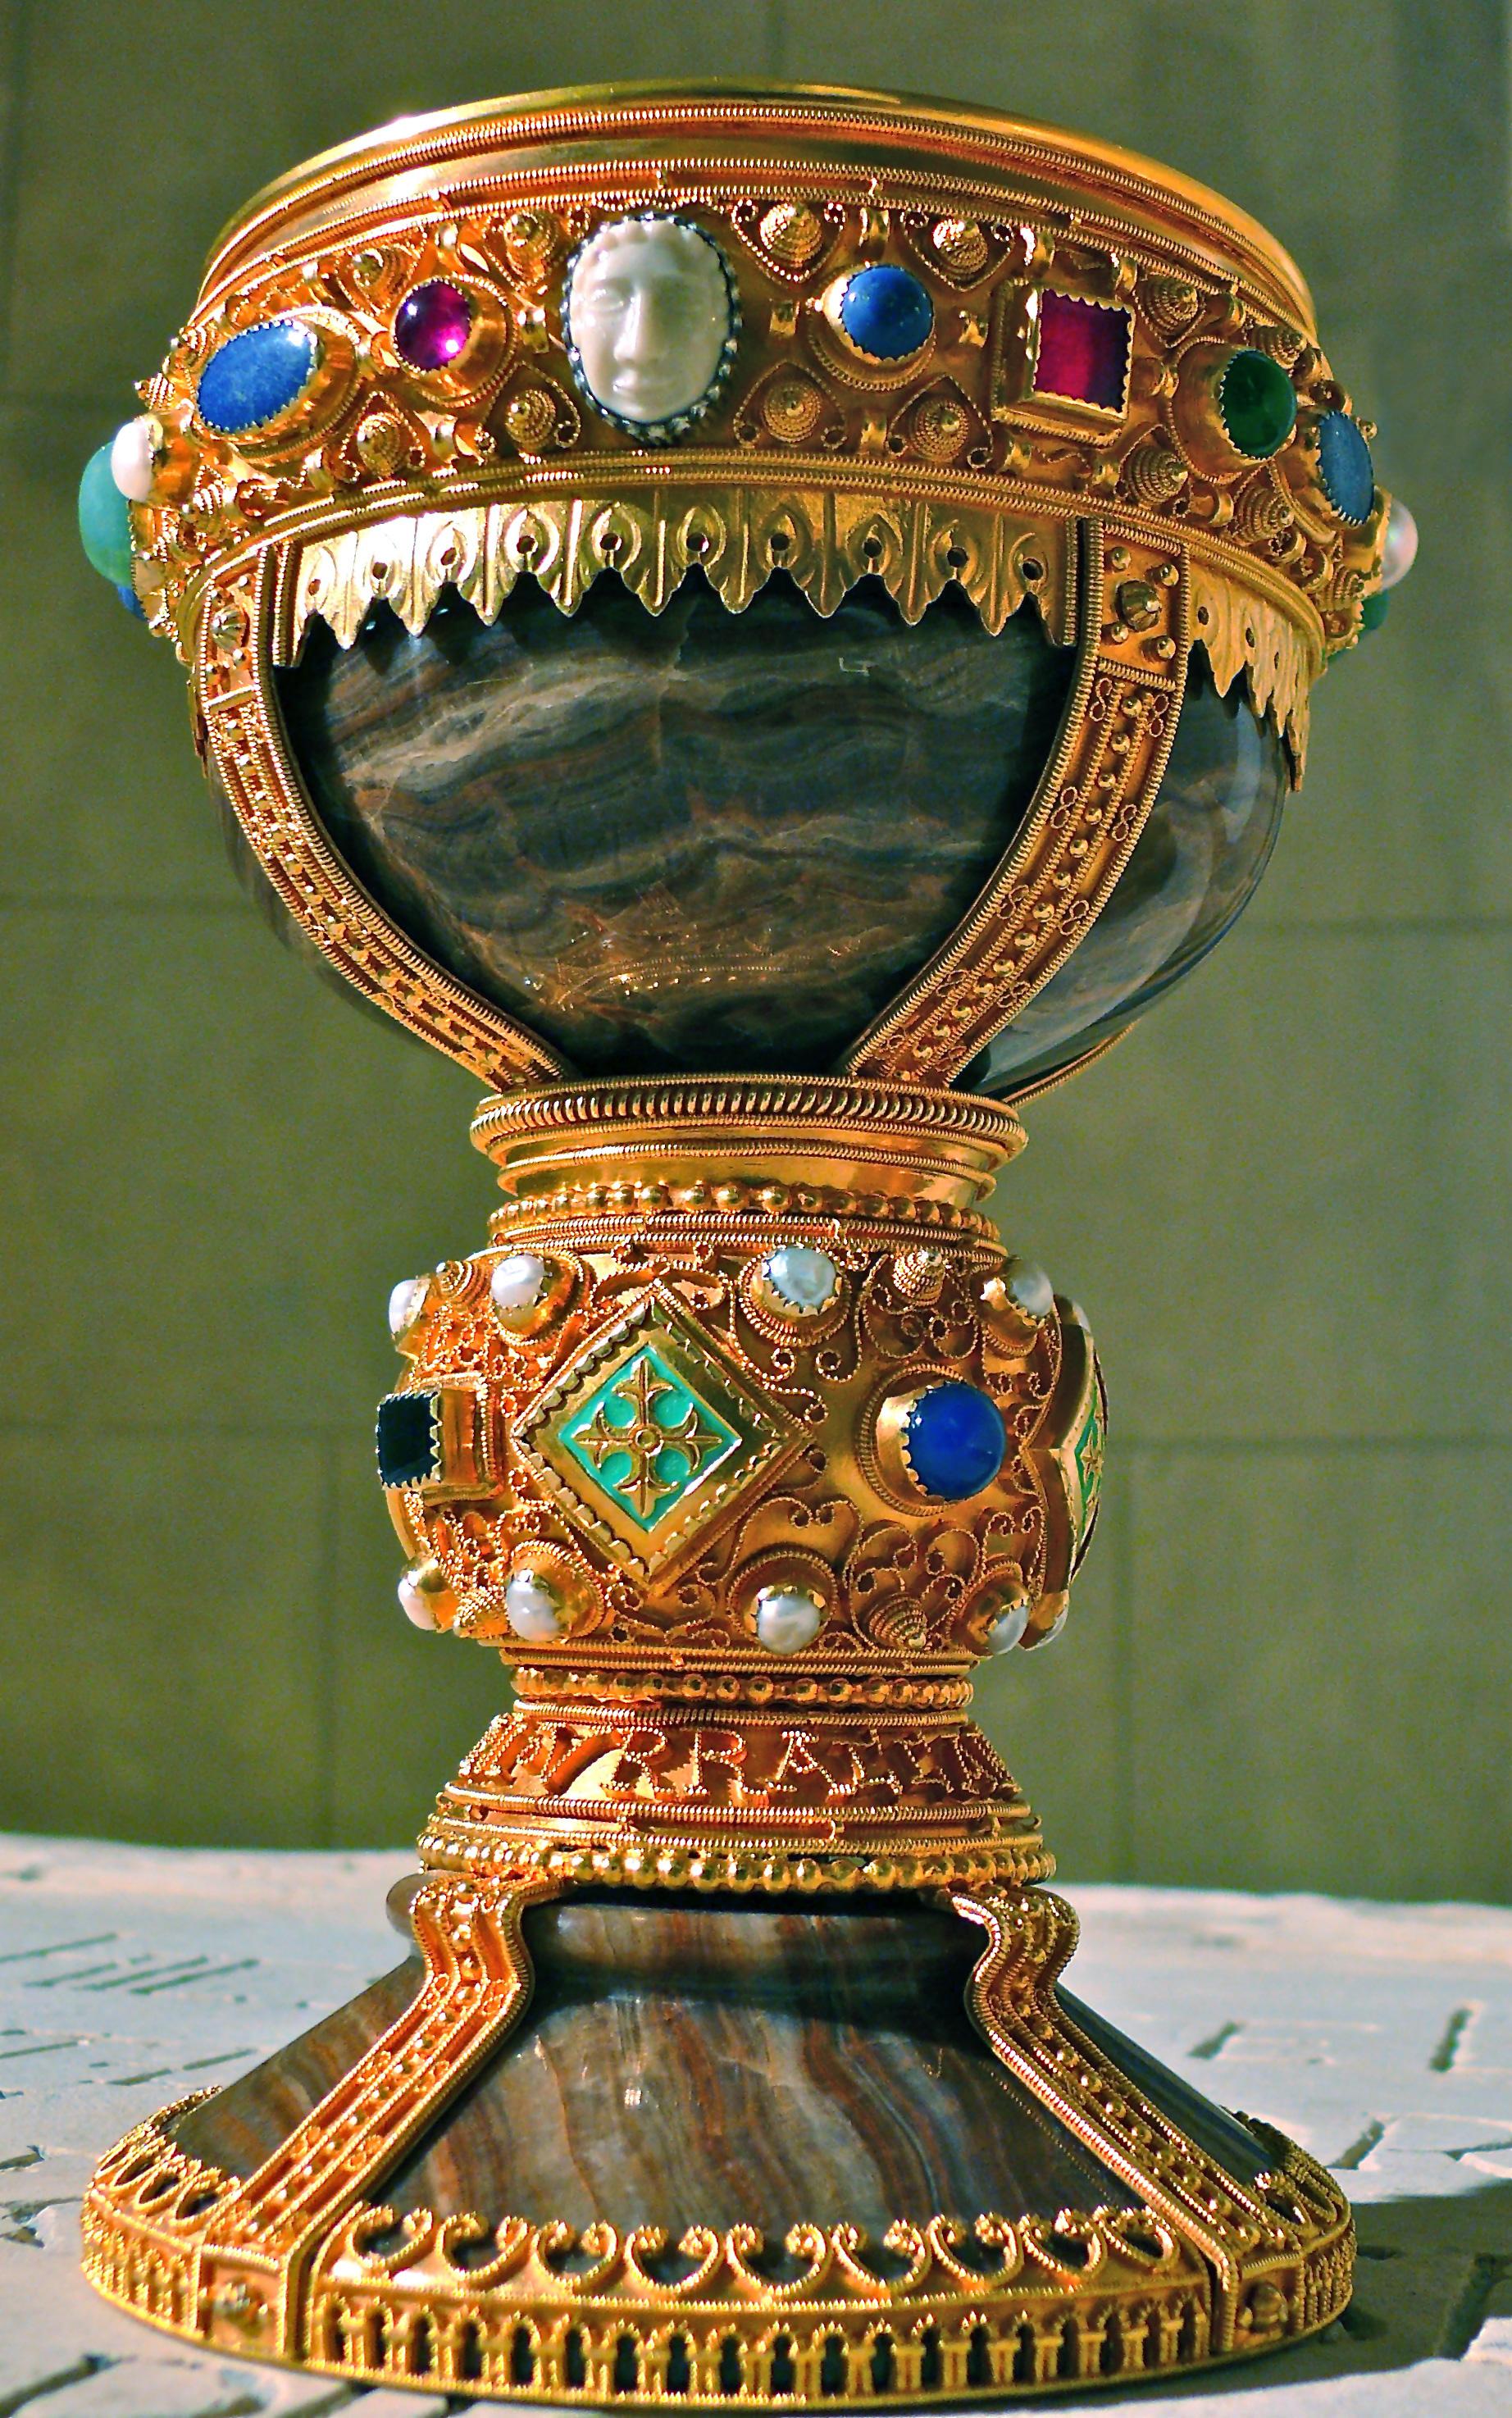 Cáliz de doña Urraca - Wikipedia, la enciclopedia libre